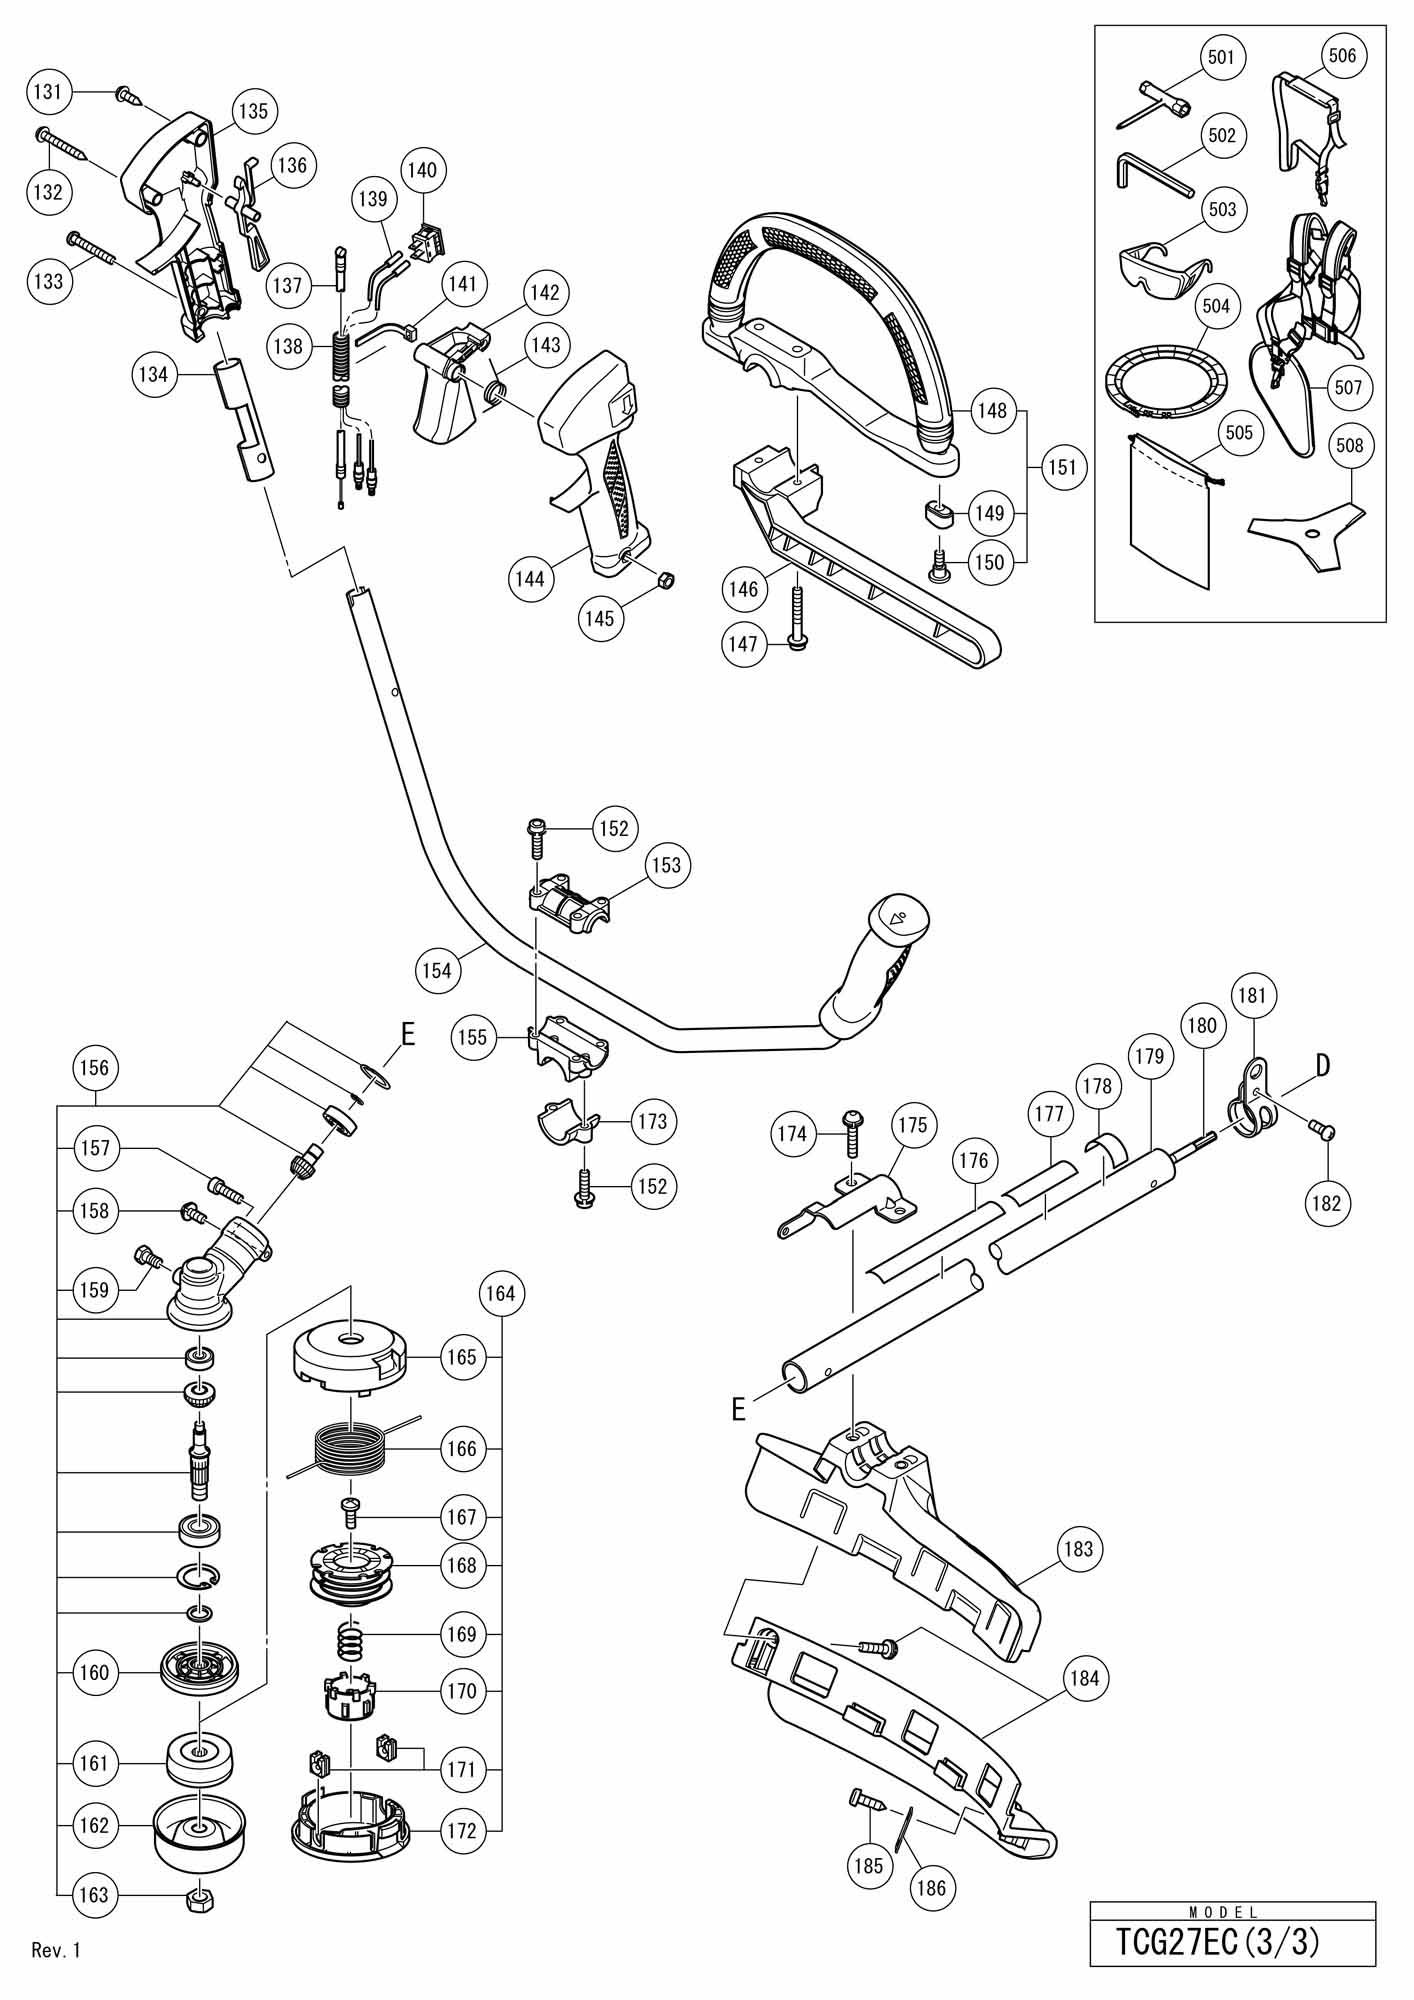 Hitachi Engine Grass Trimmer/brush Cutter Tcg 27ec SPARE